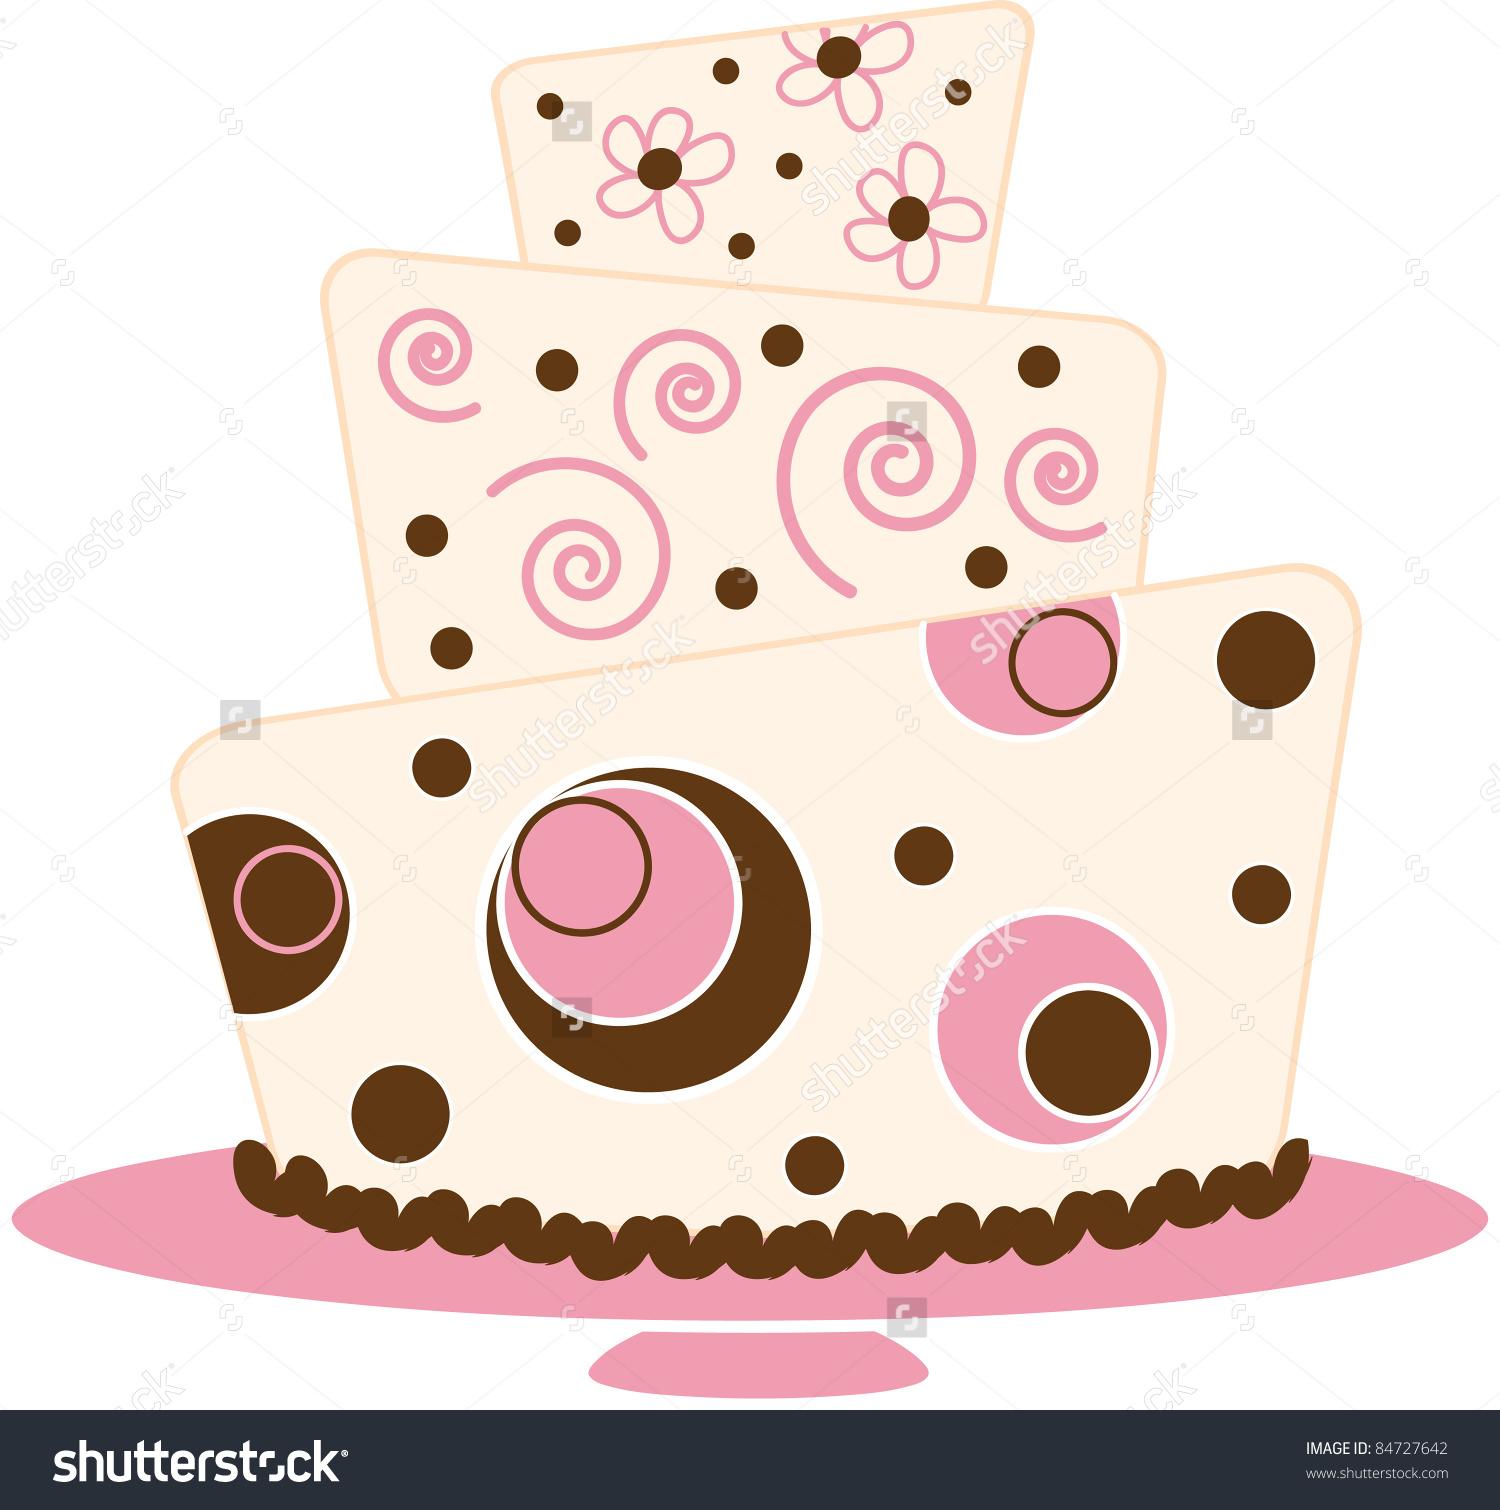 Clip Art Illustration Fancy Layer Cake Stock Illustration 84727642.